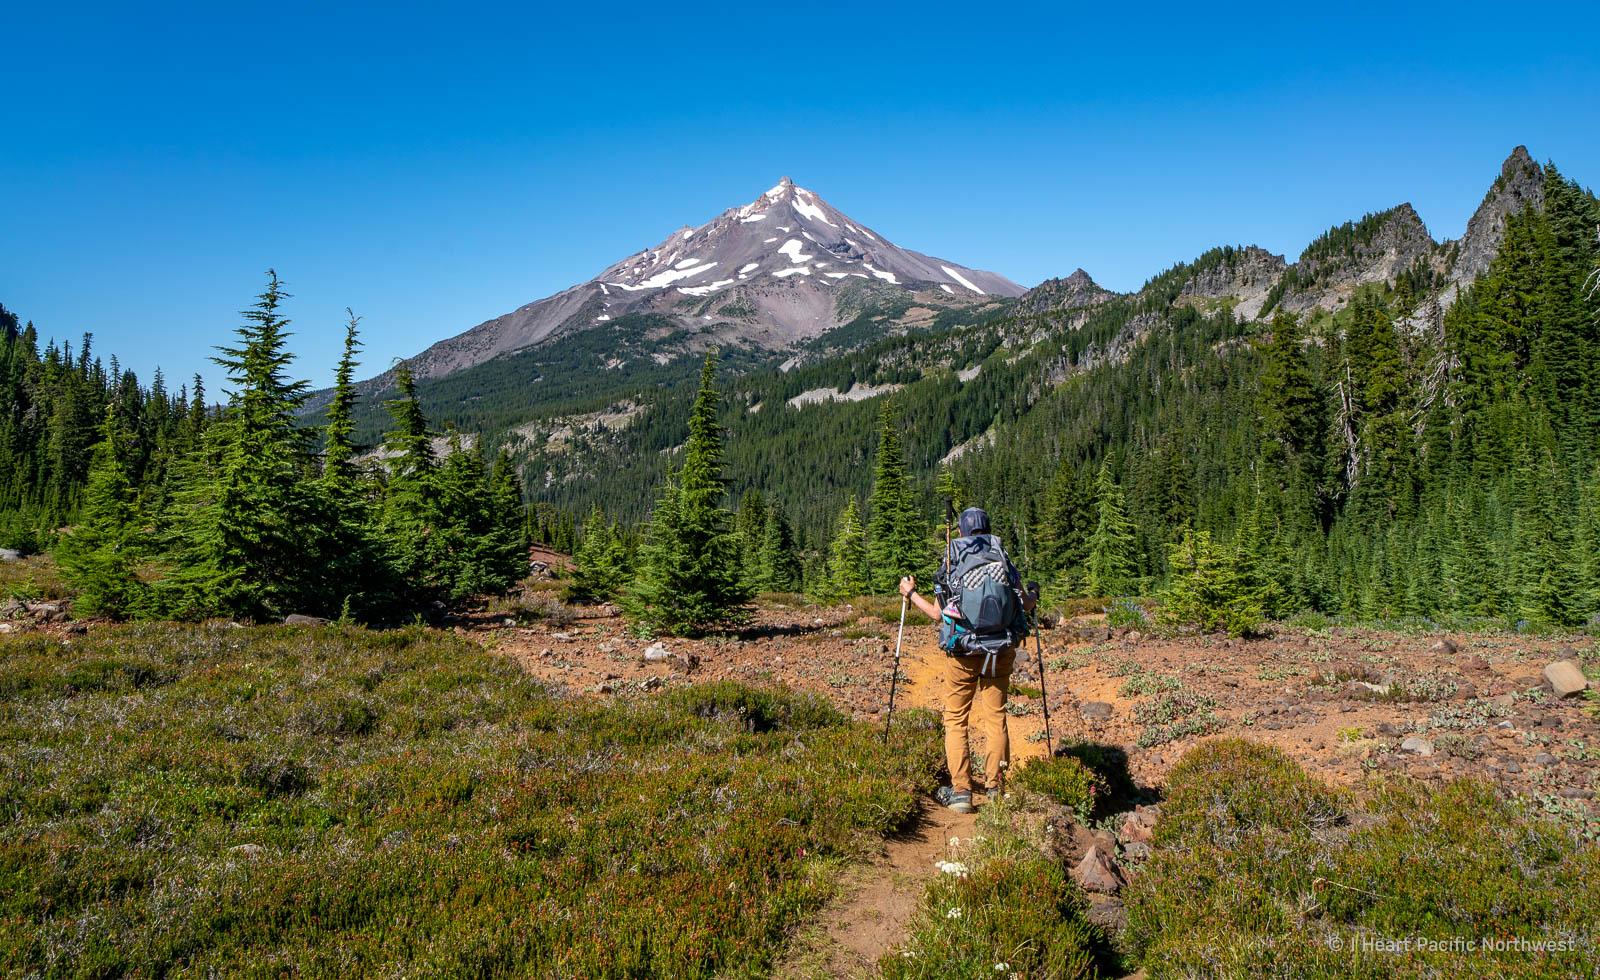 Mount Jefferson Wilderness - Hunts Cove backpacking trip